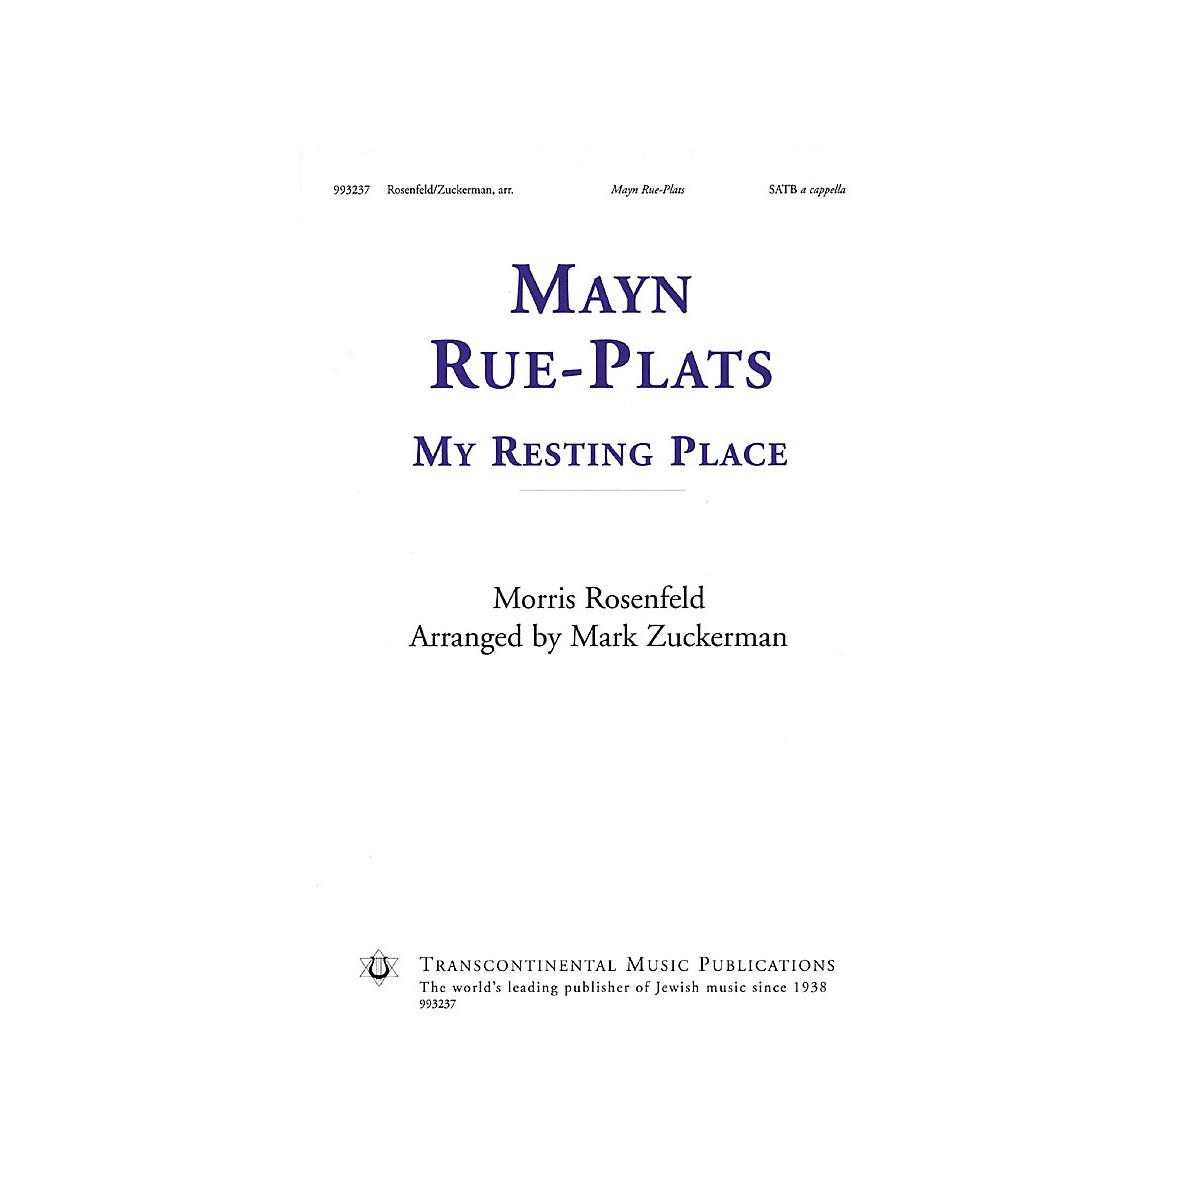 Transcontinental Music Mayn Rue-Plats (My Resting Place) SATB a cappella arranged by Mark Zuckerman